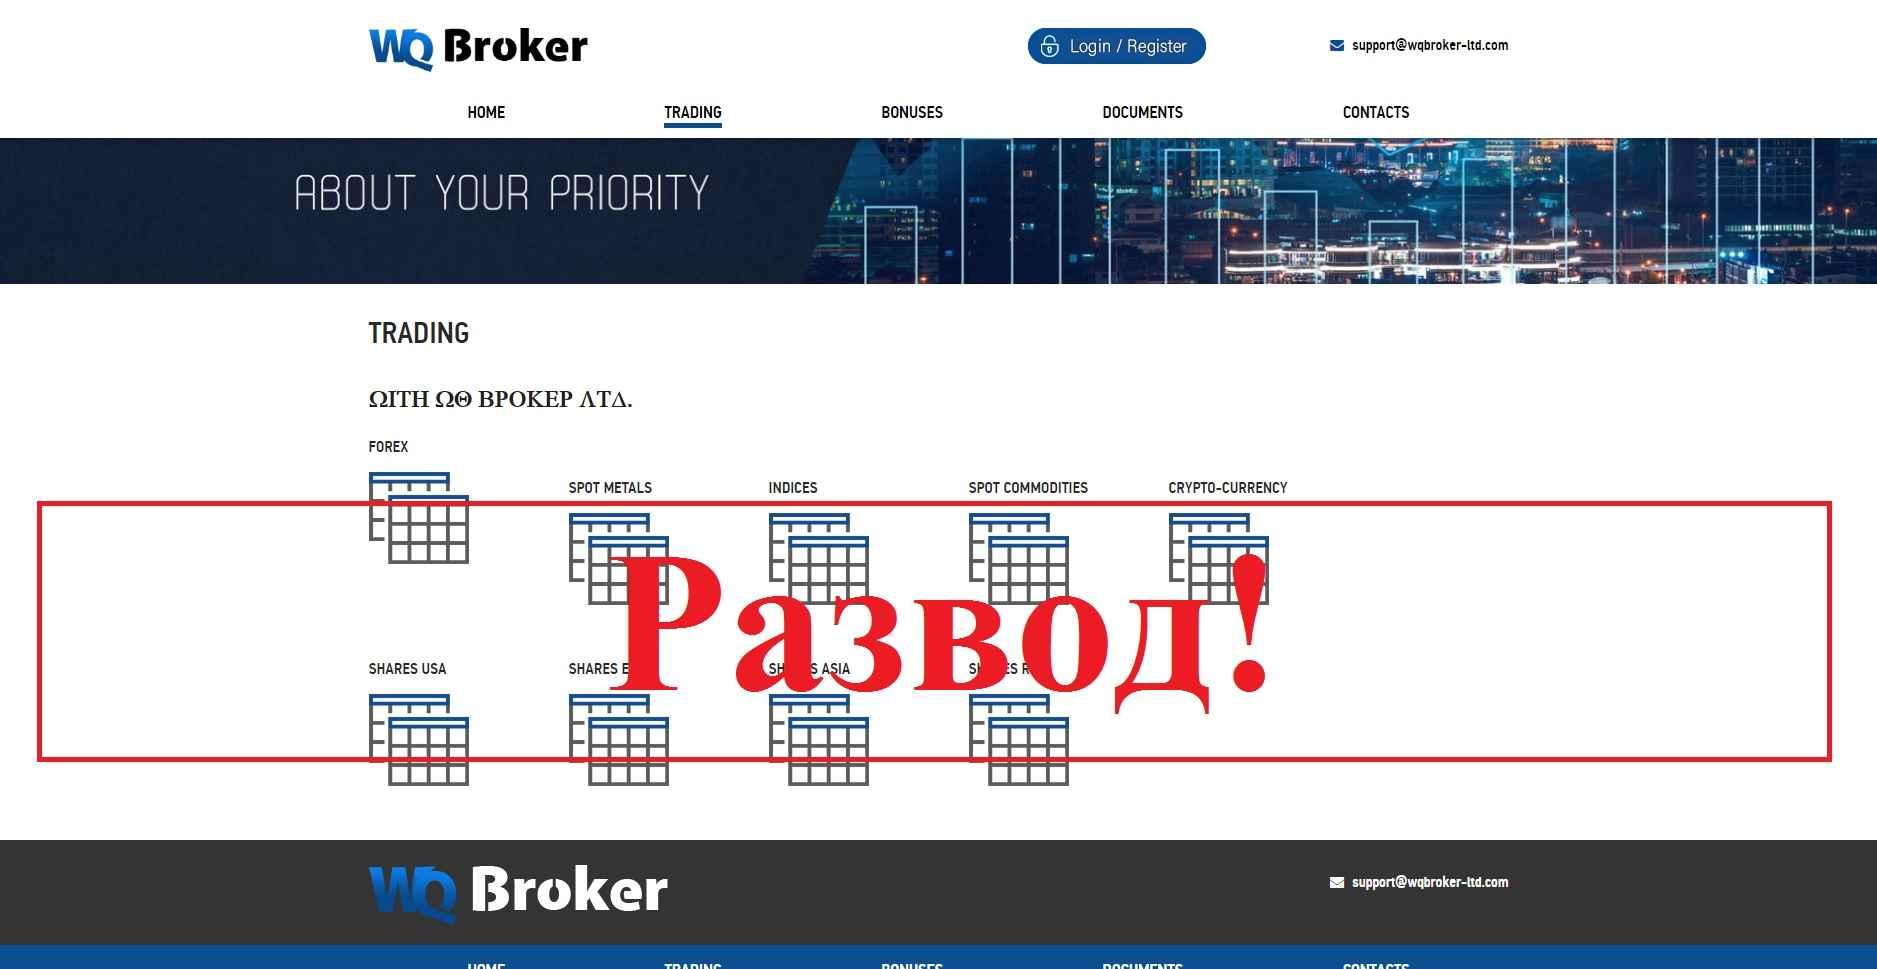 WQ Broker – честный брокер? Отзывы о wqbroker-ltd.com